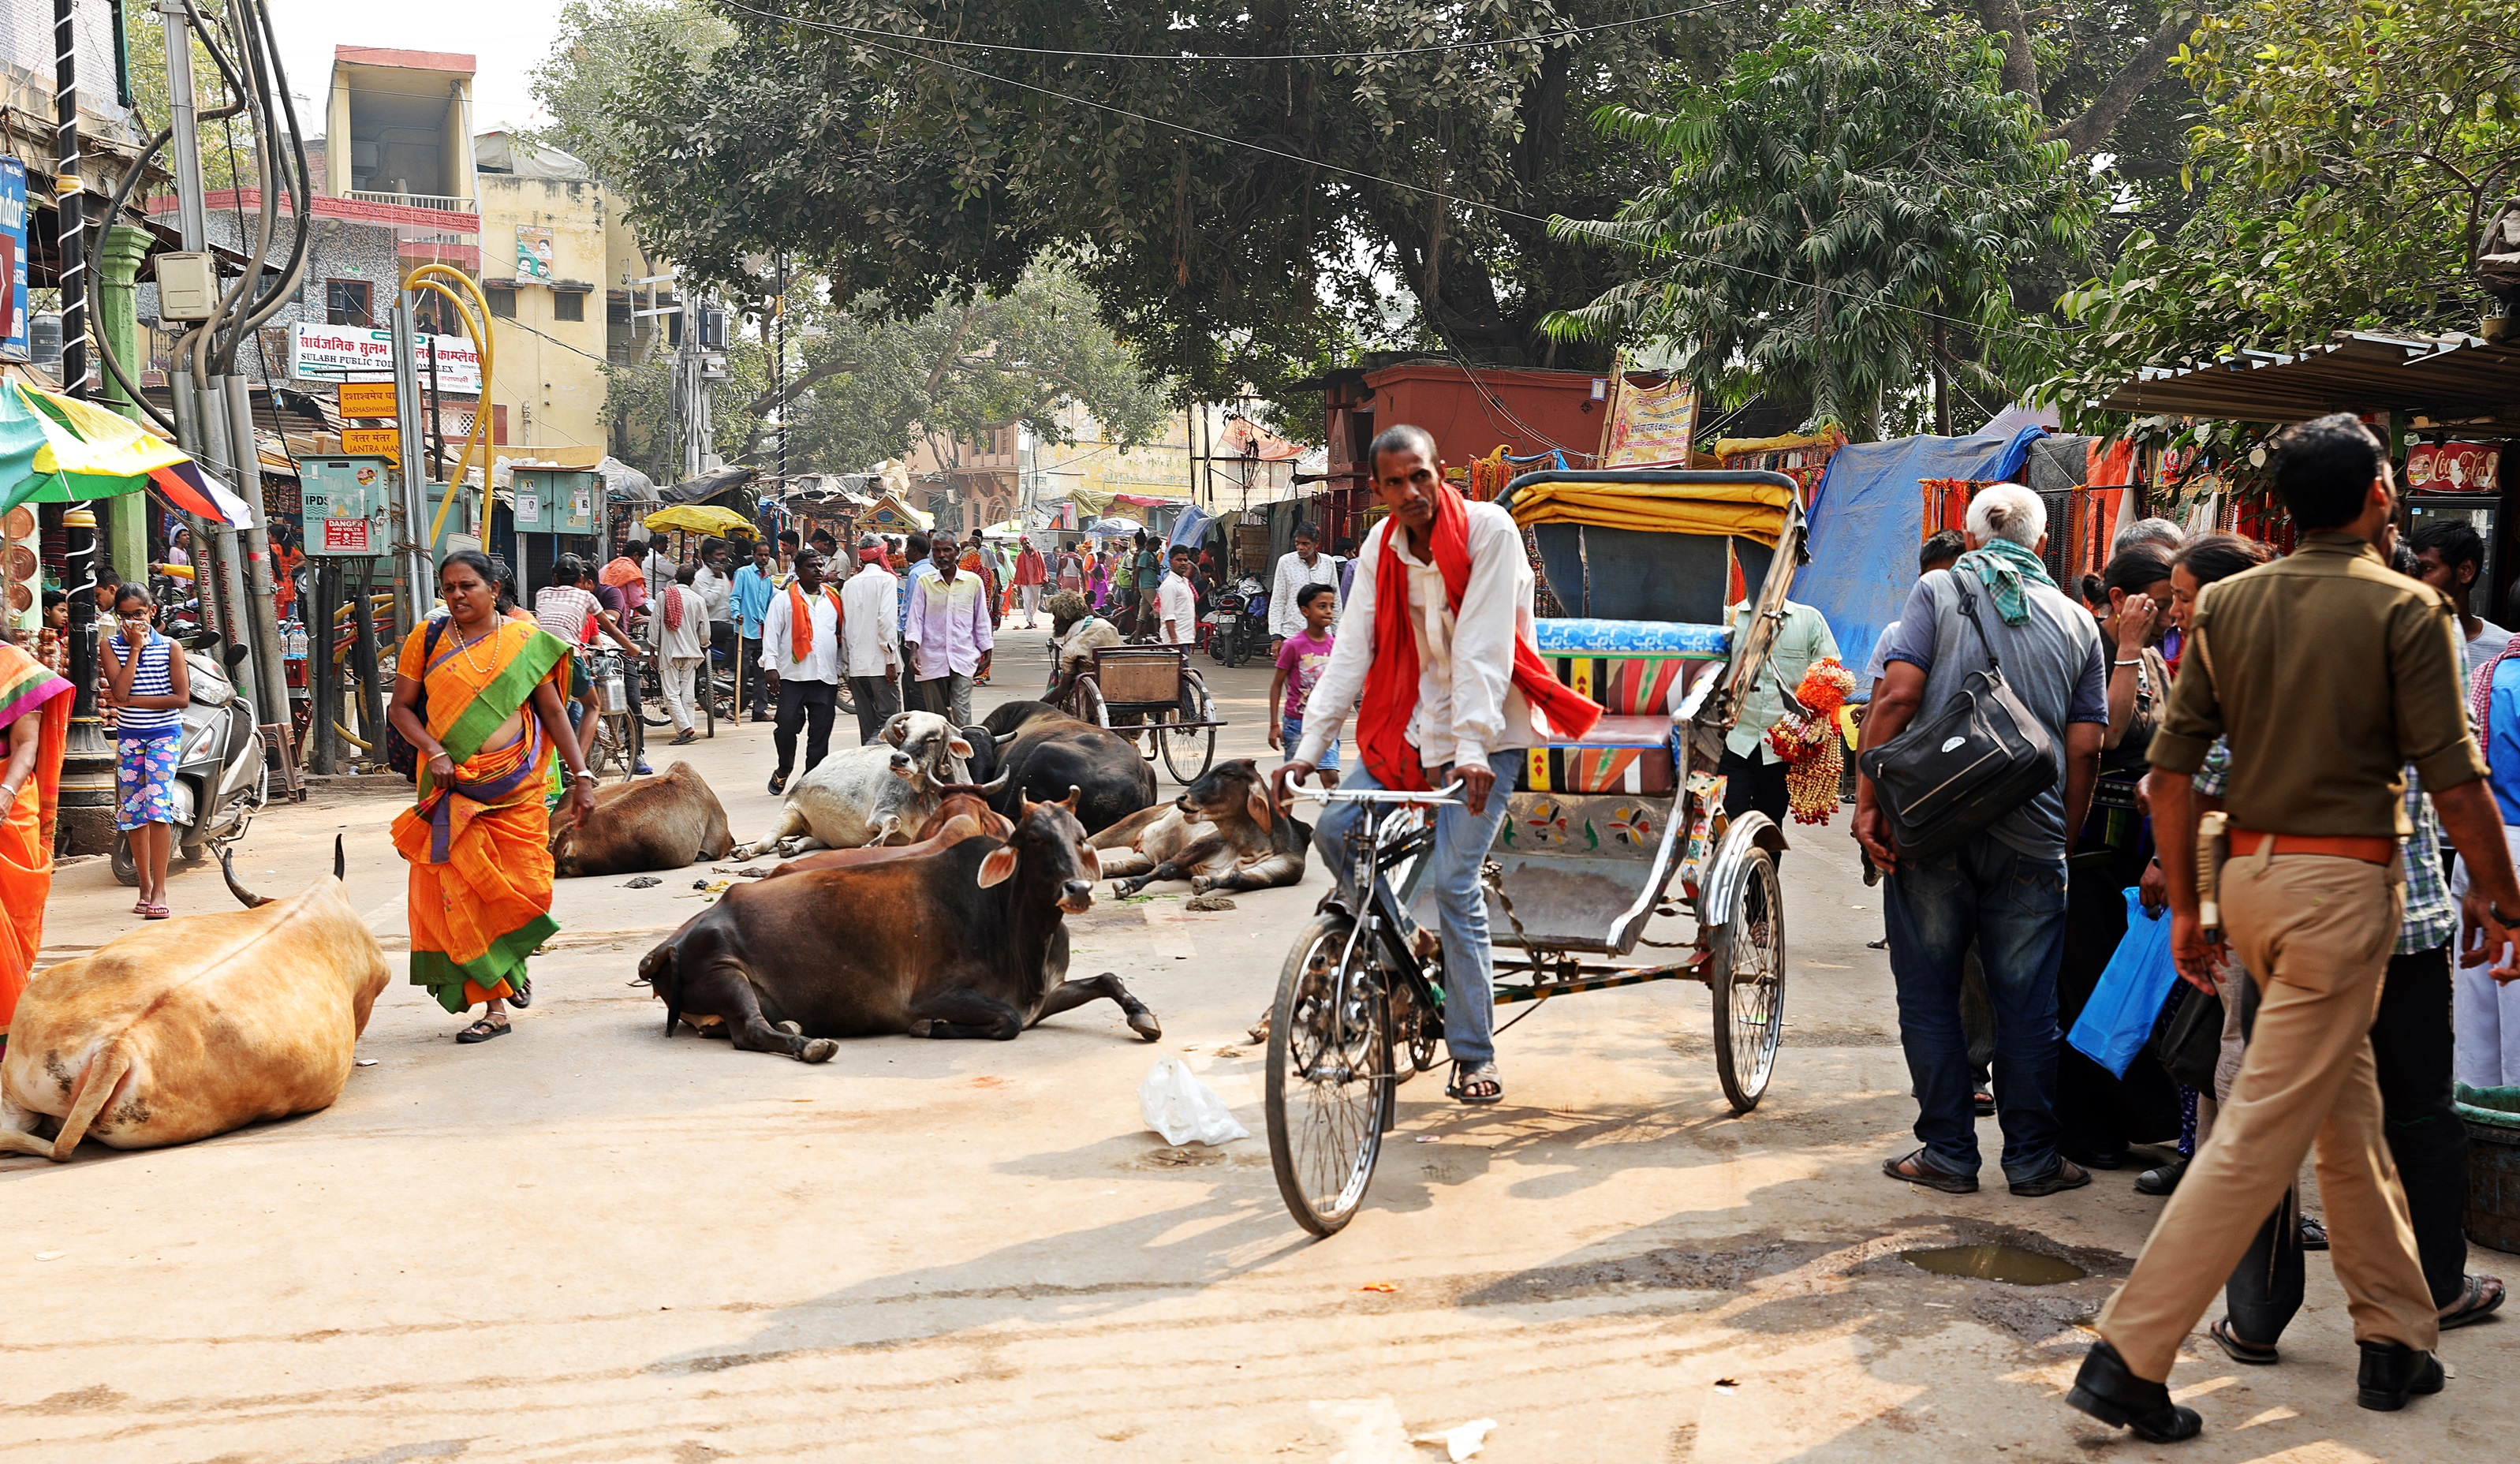 Street cows, Varanasi